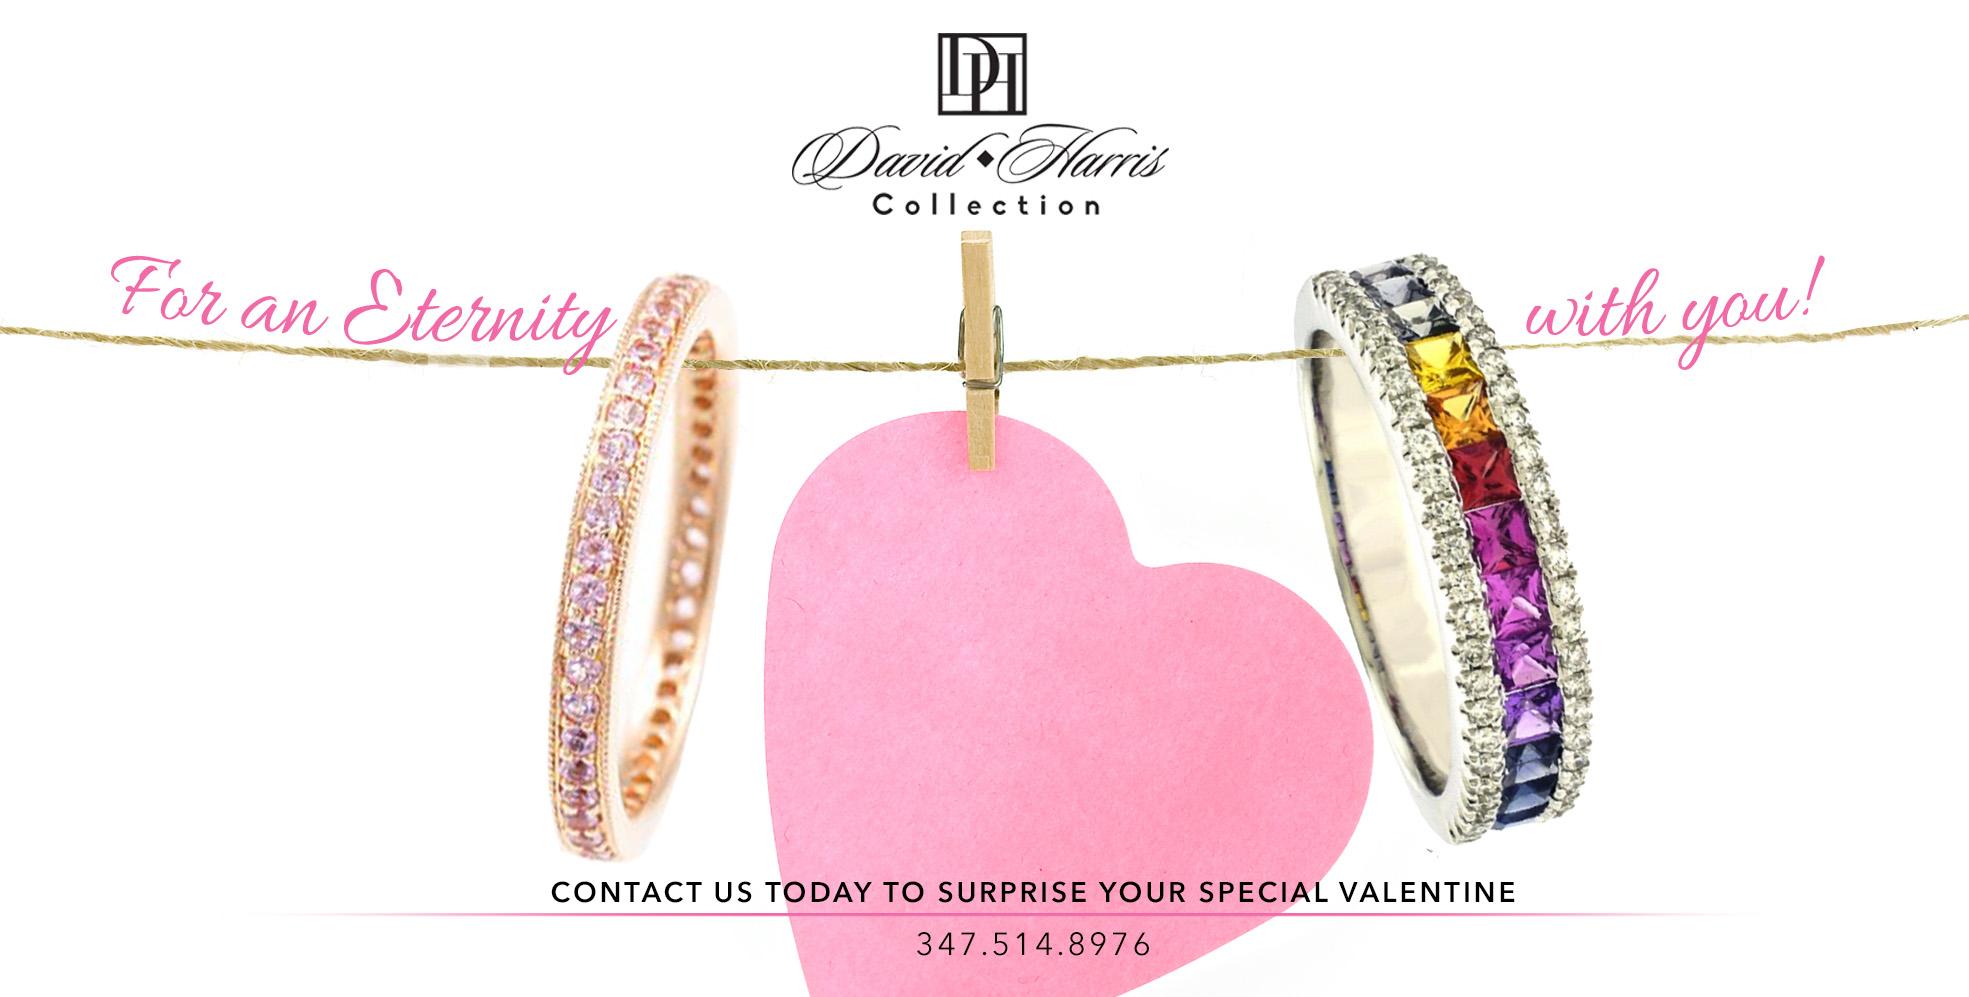 DHC_Valentines18_01302018_5